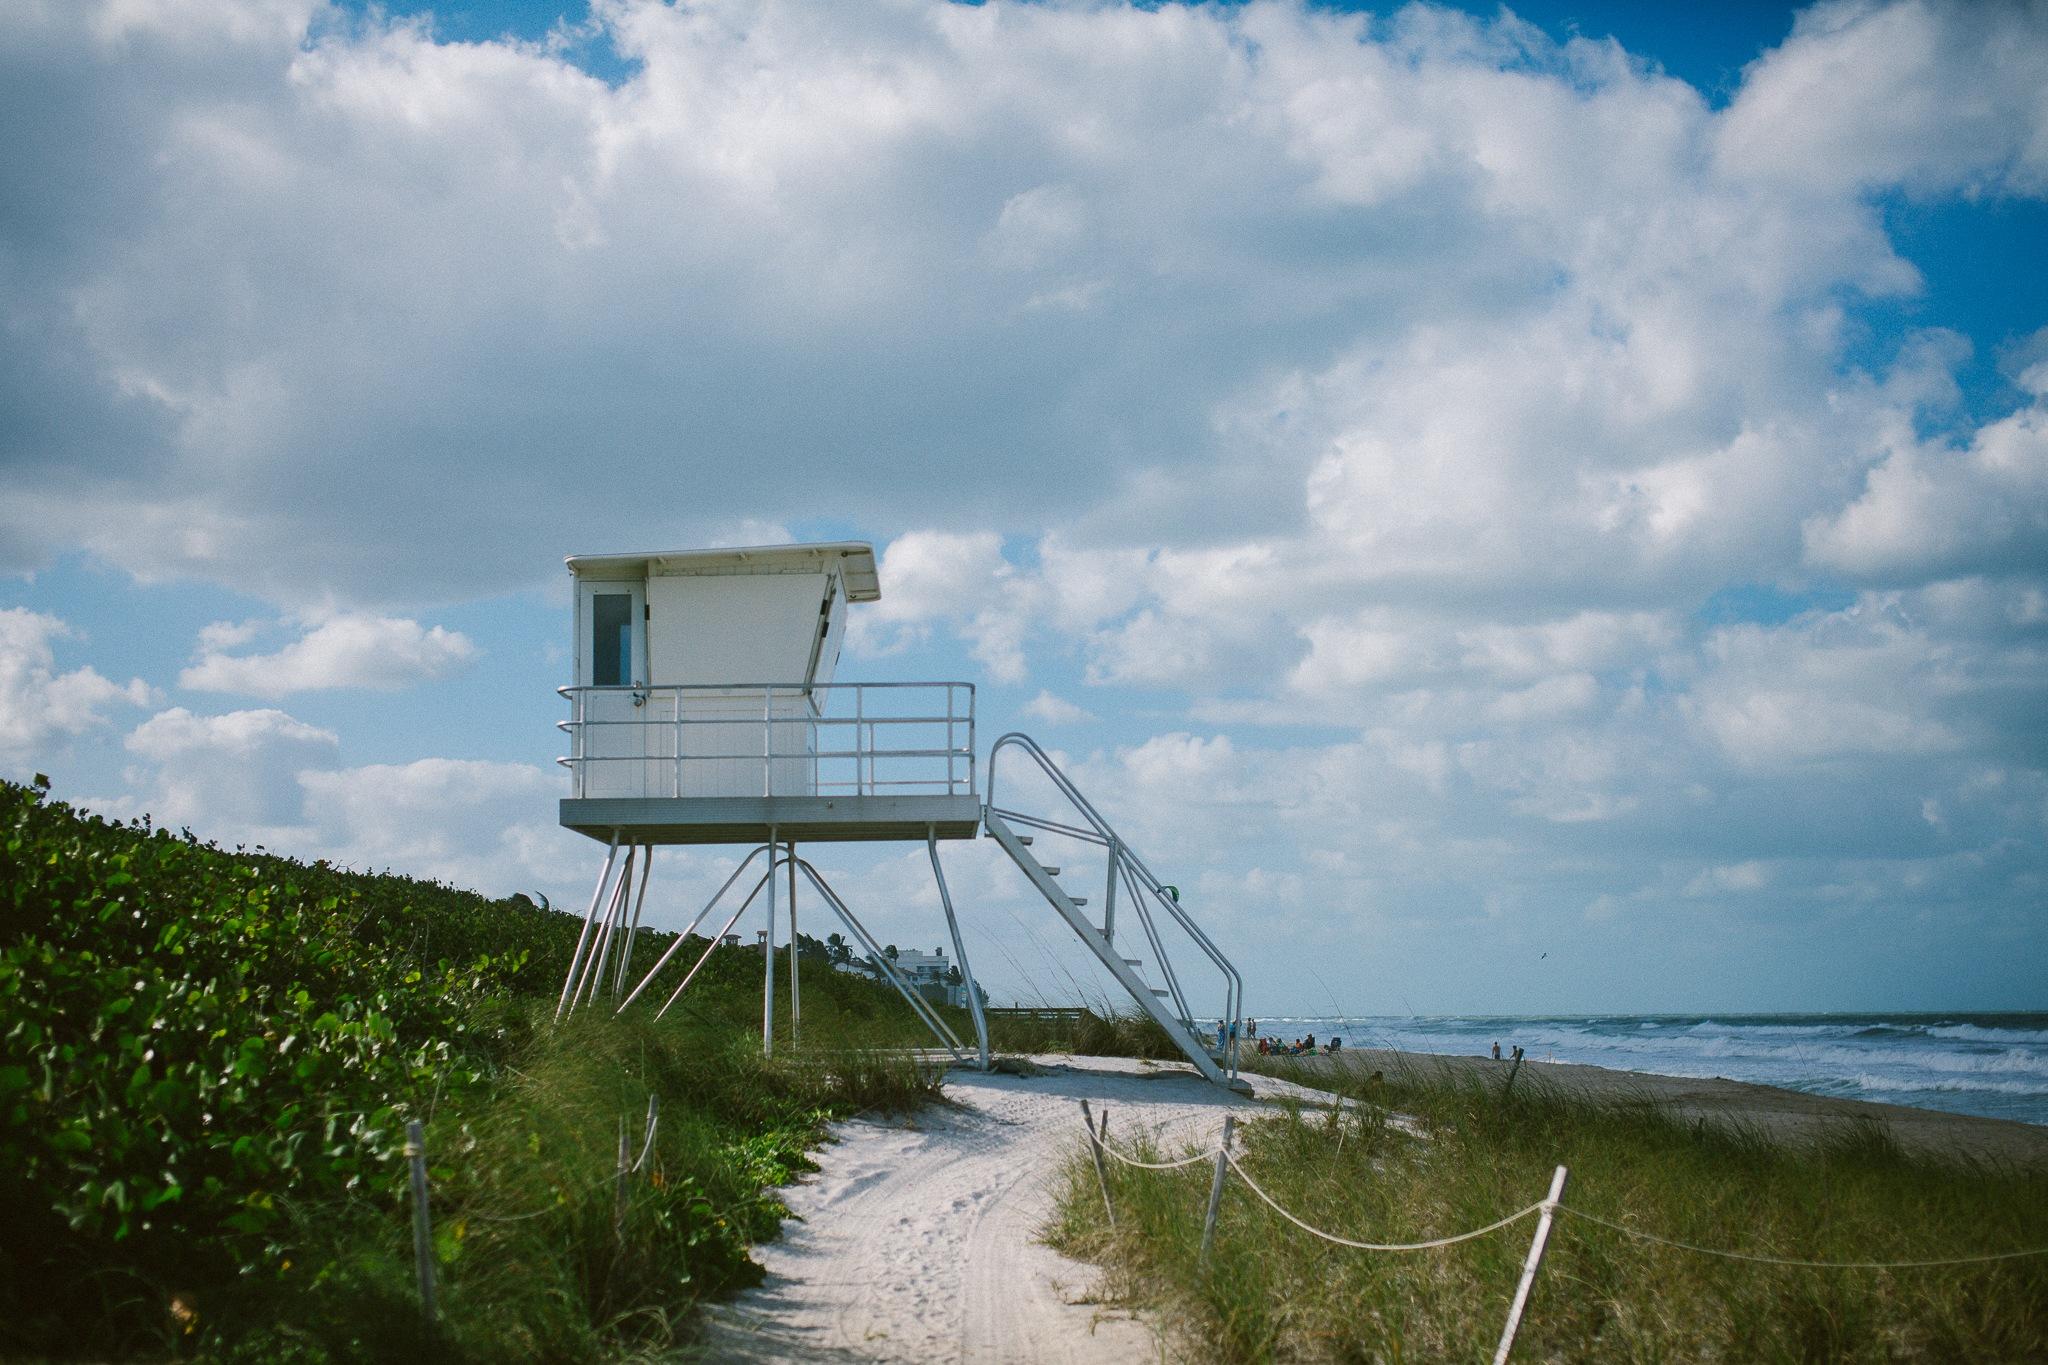 Beach cabin by Felix G Padrosa